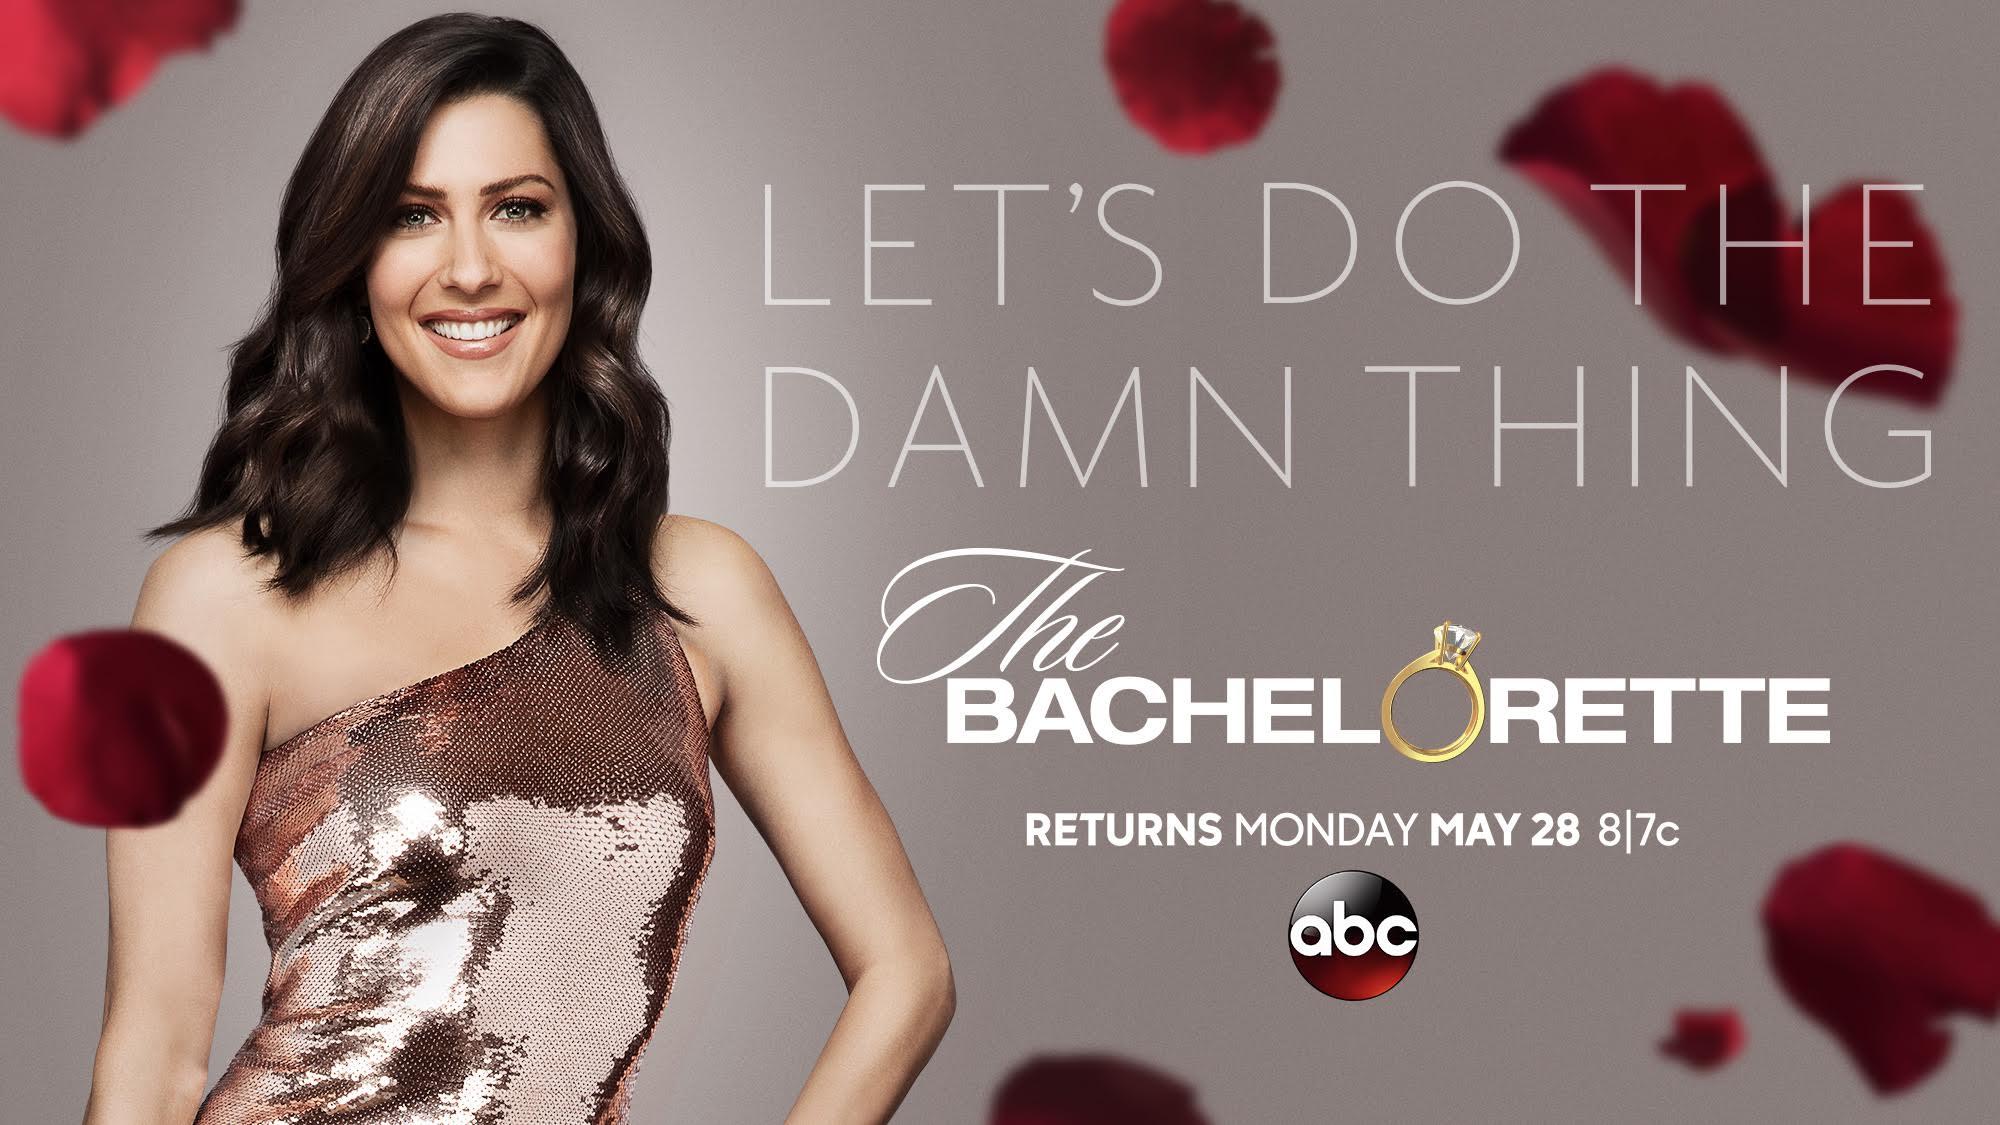 Bachelorette - Binge worthy TV